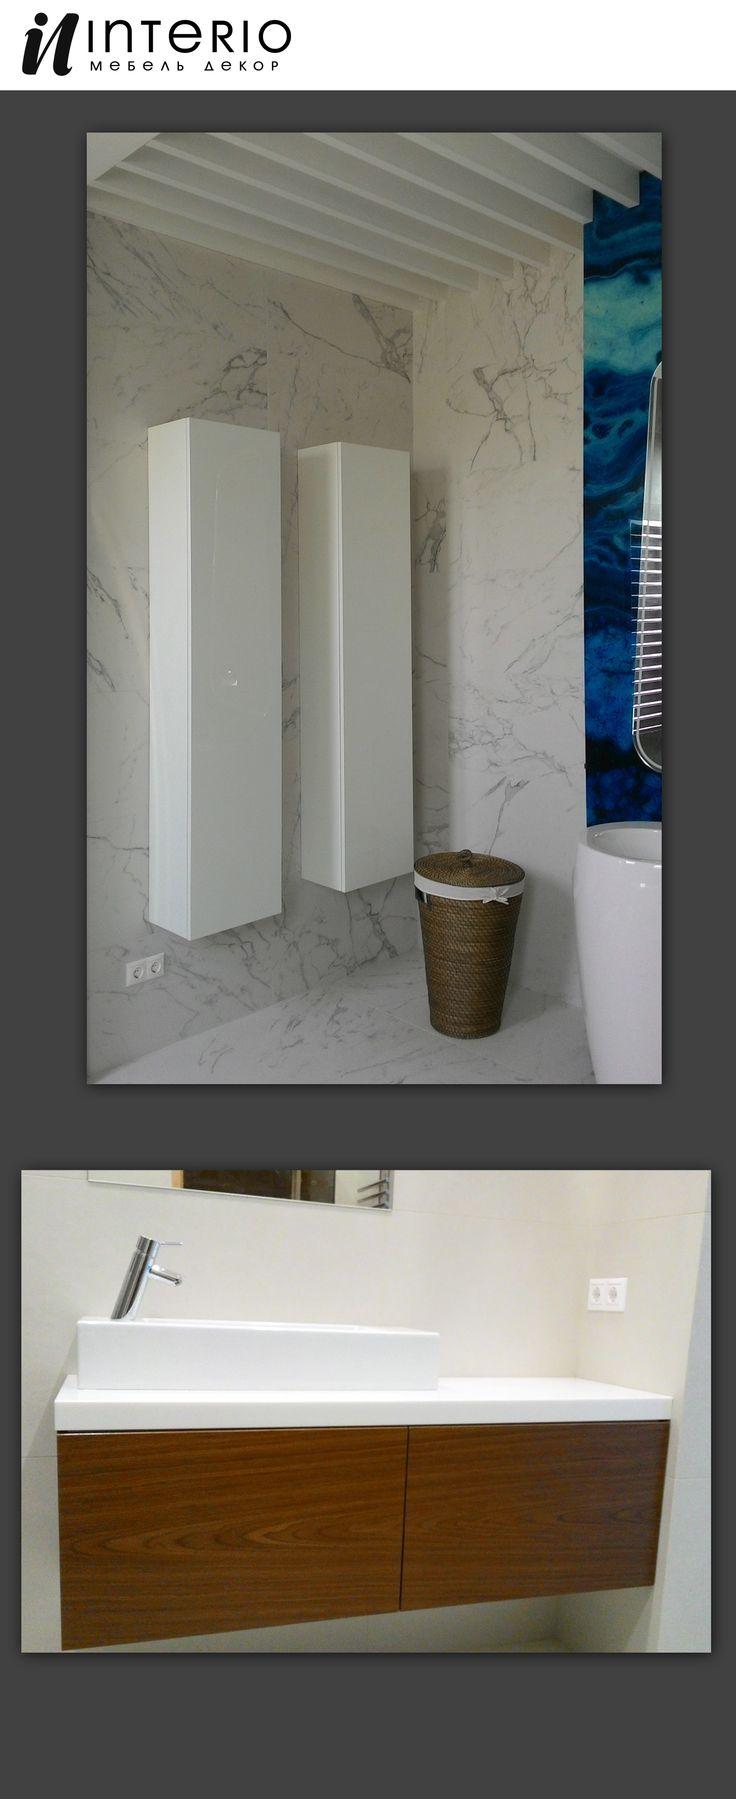 Шкафчики для ванной комнаты. Материал МДФ покраска. Тумбочка шпон, каменная столешница.